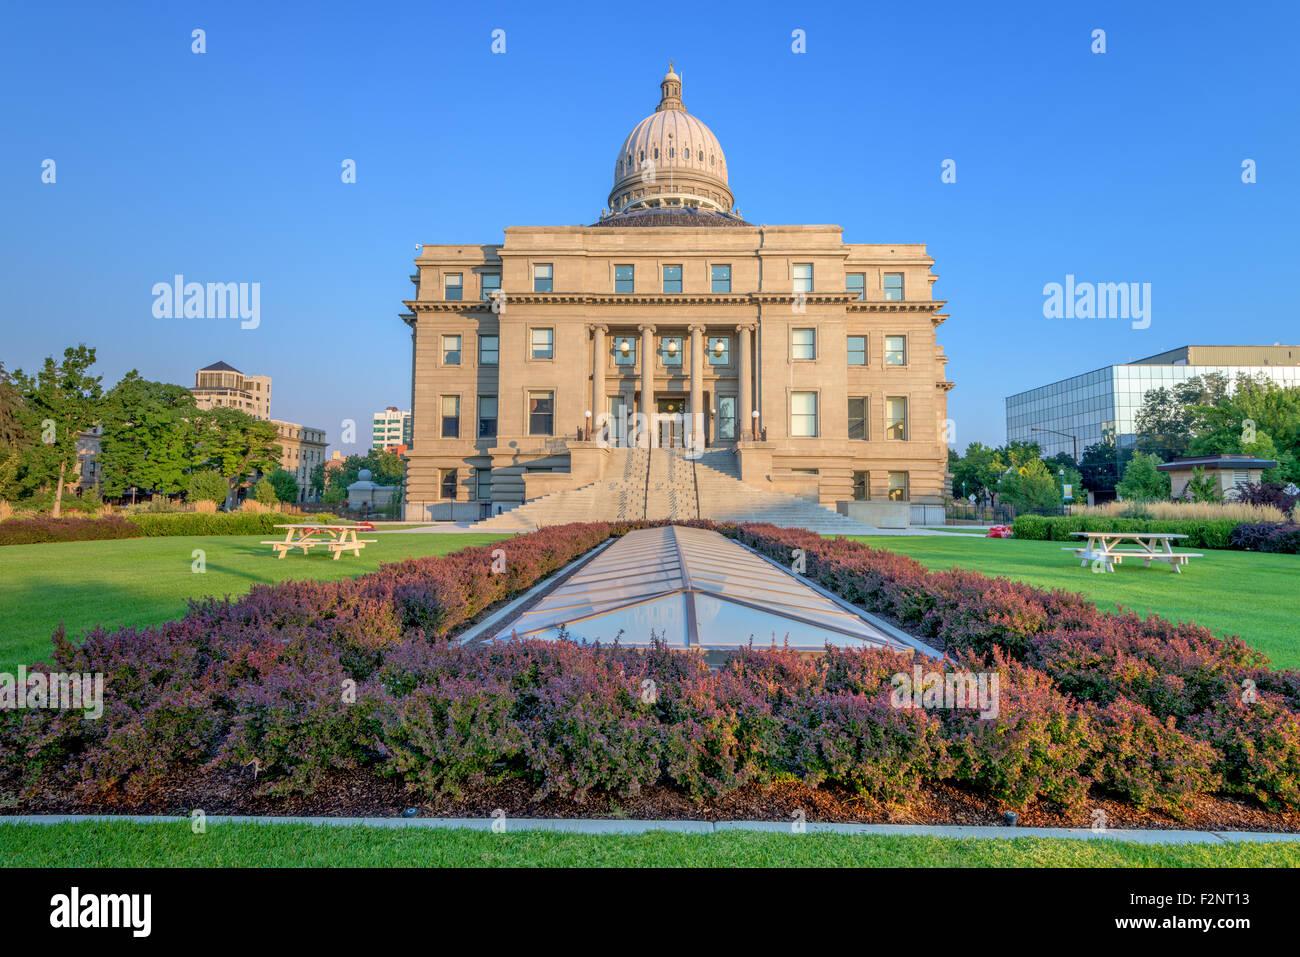 Morning and park at the Idaho capital building Stock Photo